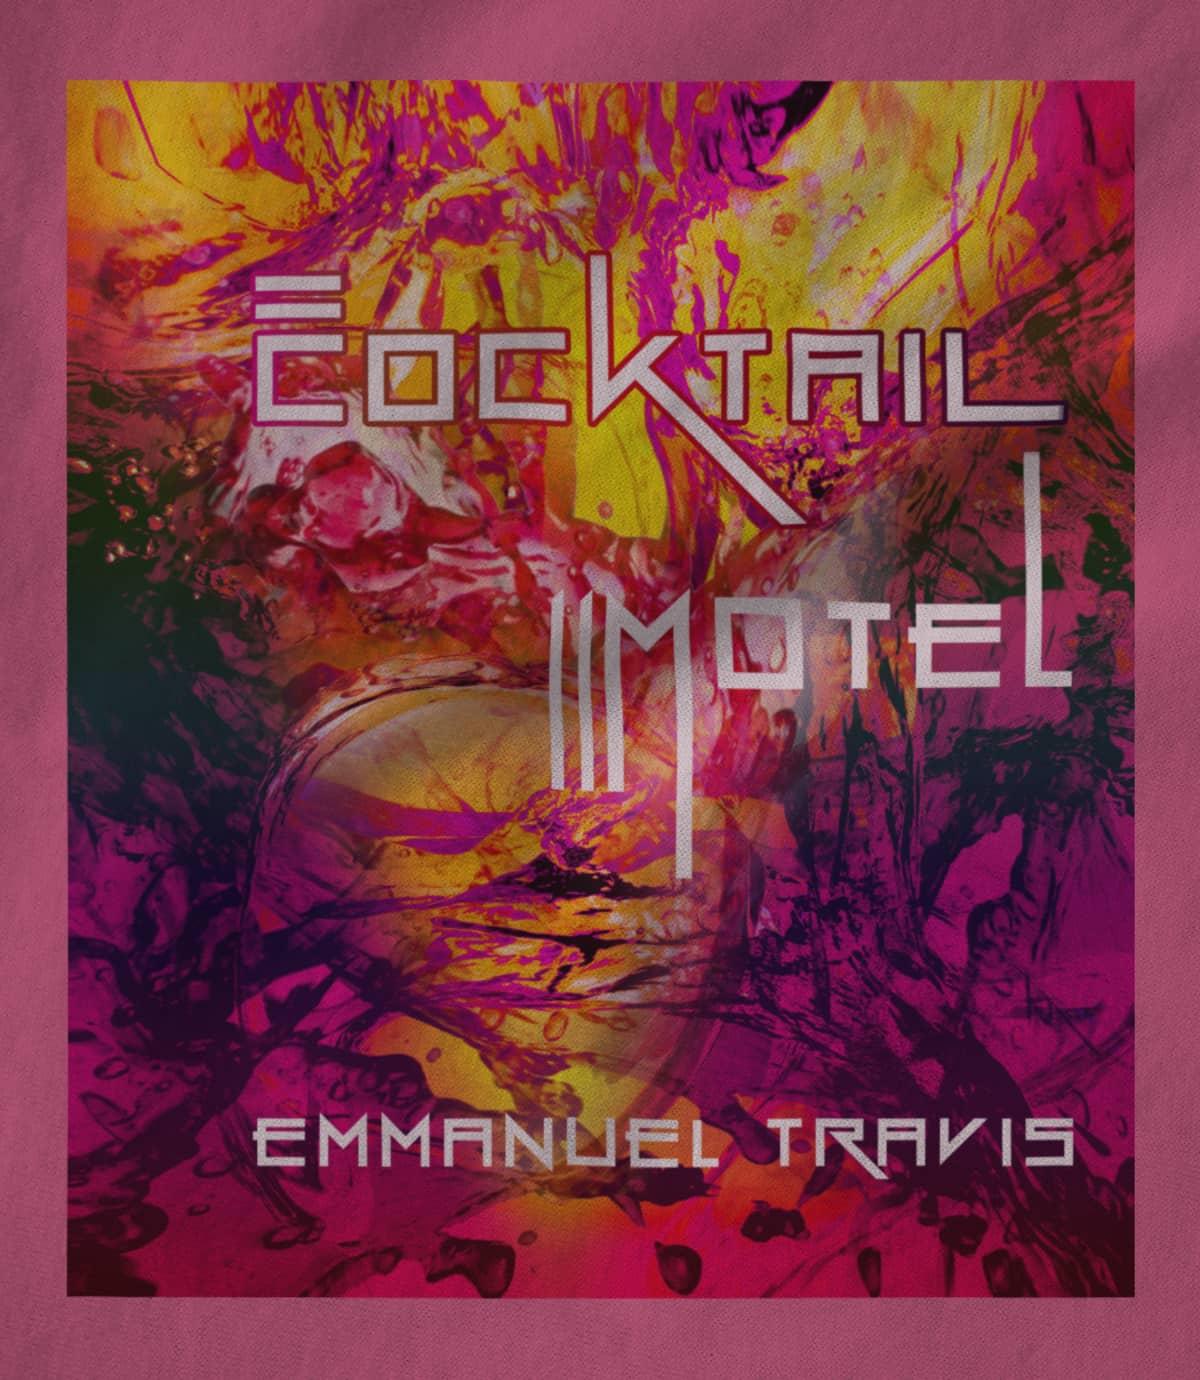 Emmanuel Travis